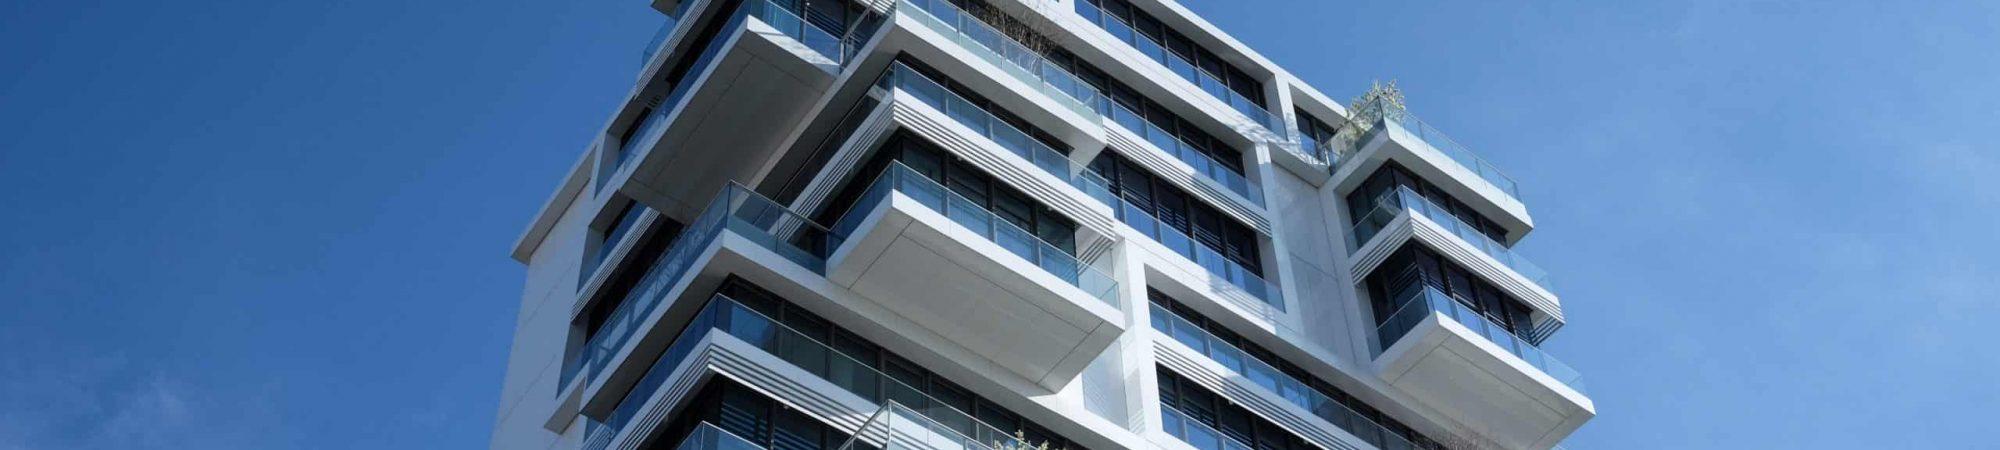 pexels-ניהול ואחזקת מבנים